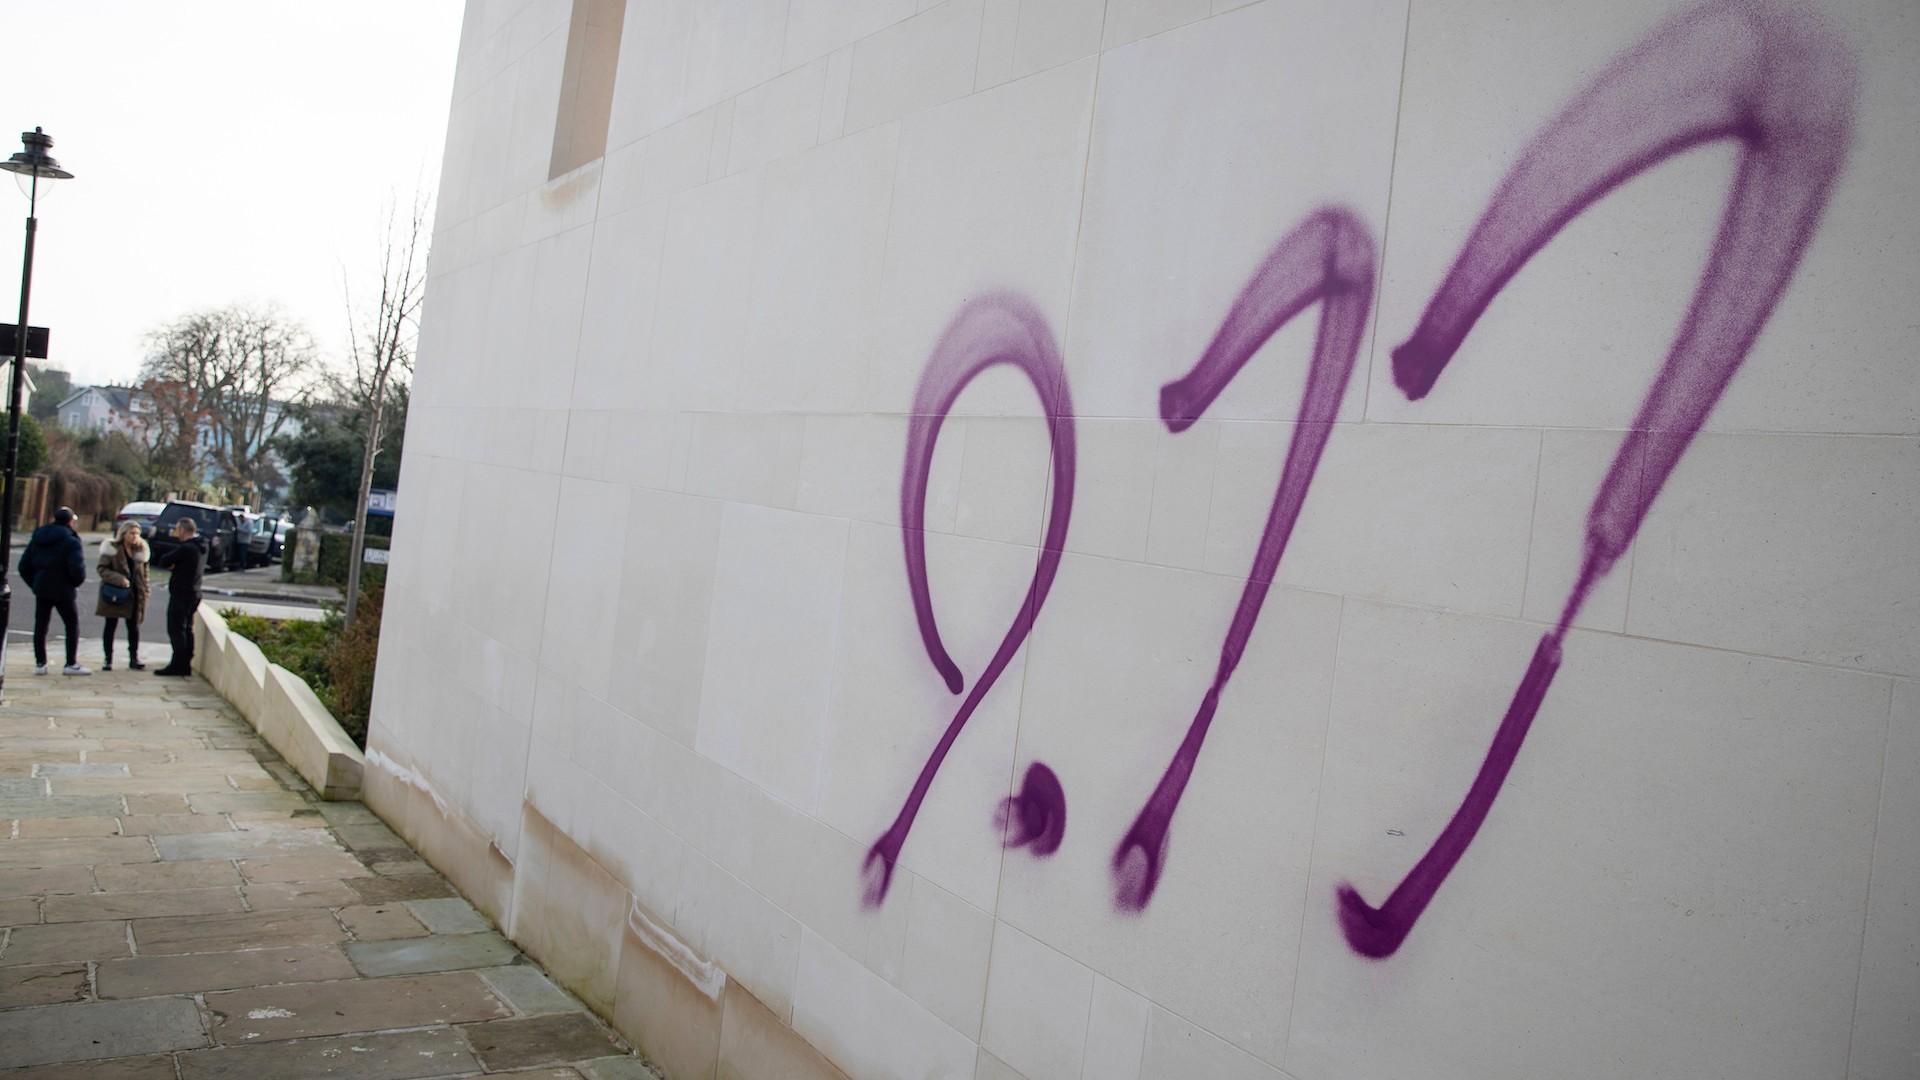 , Anti-Semites Sprayed 9/11 Conspiracy Graffiti on a London Synagogue, Saubio Making Wealth